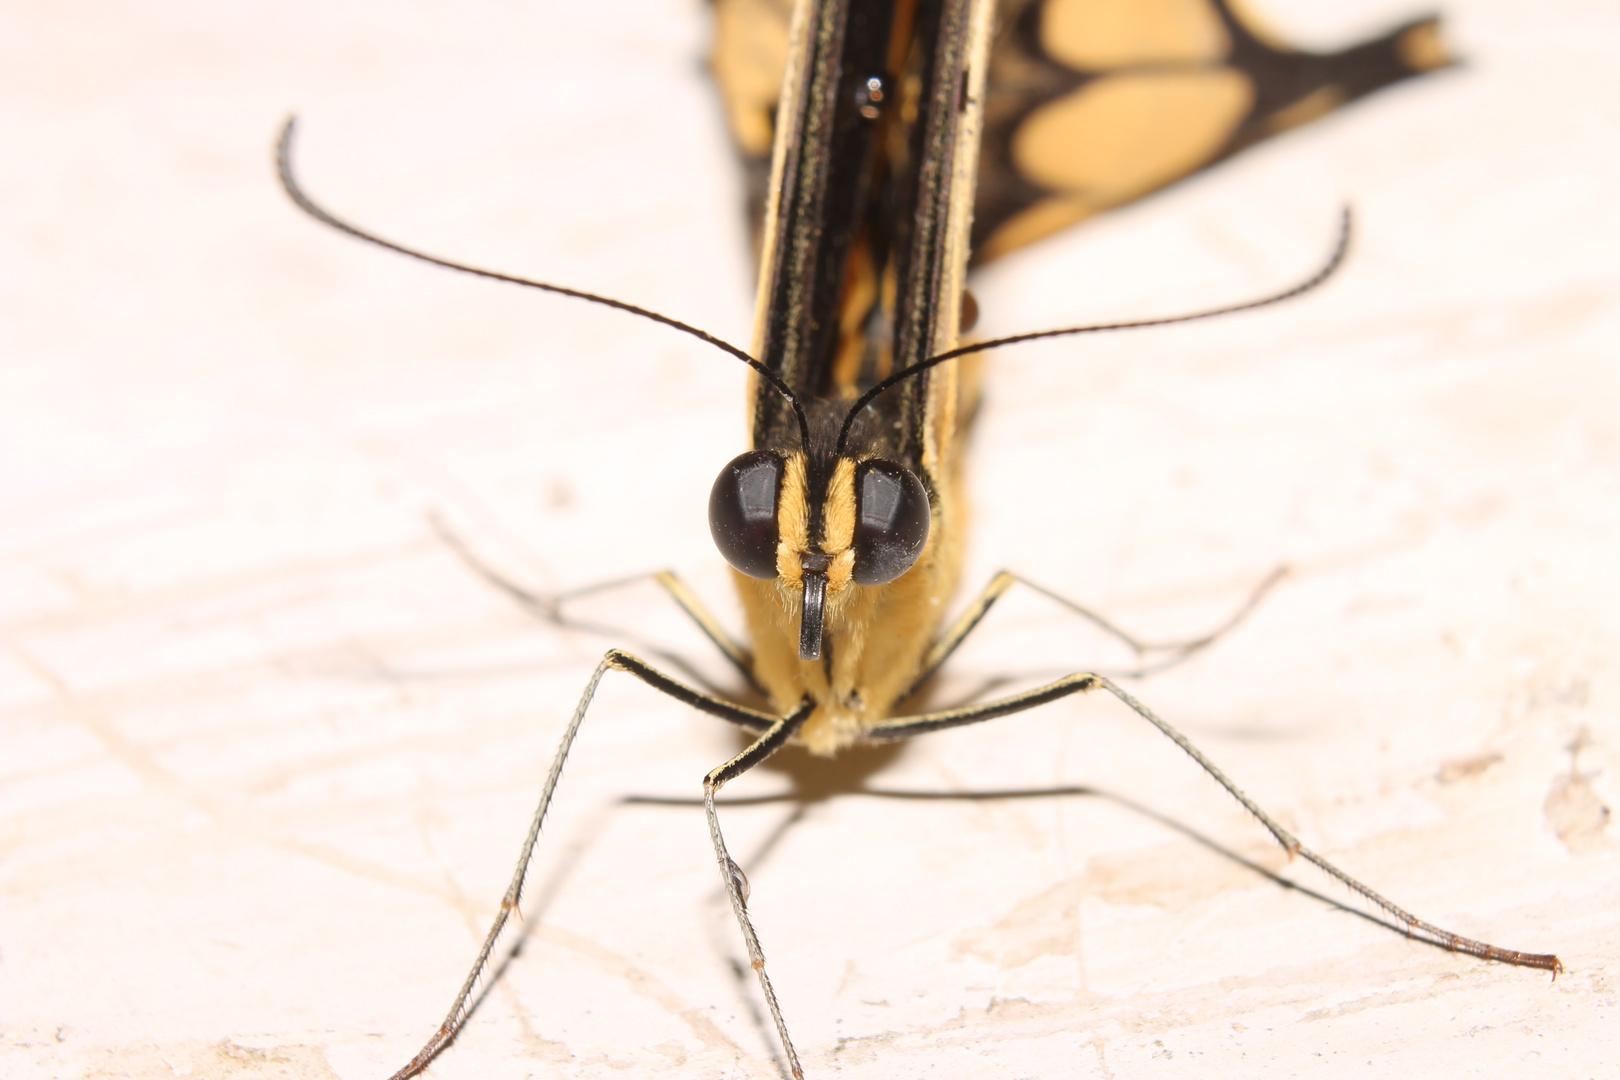 Otra foto de la mariposa